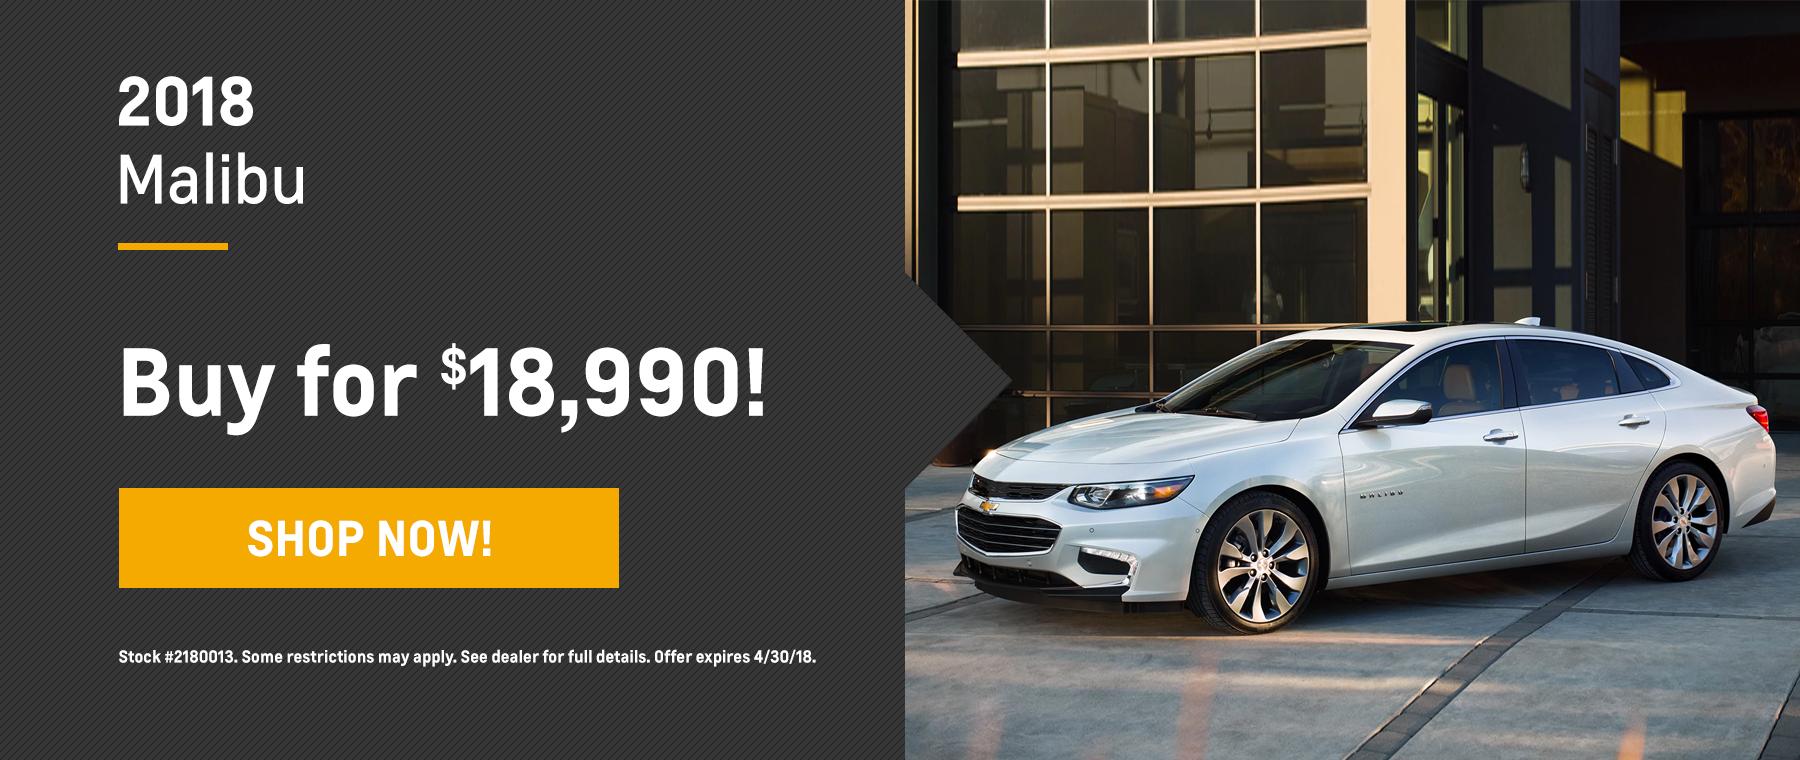 Malibu Biggers Chevrolet April Offer Homepage